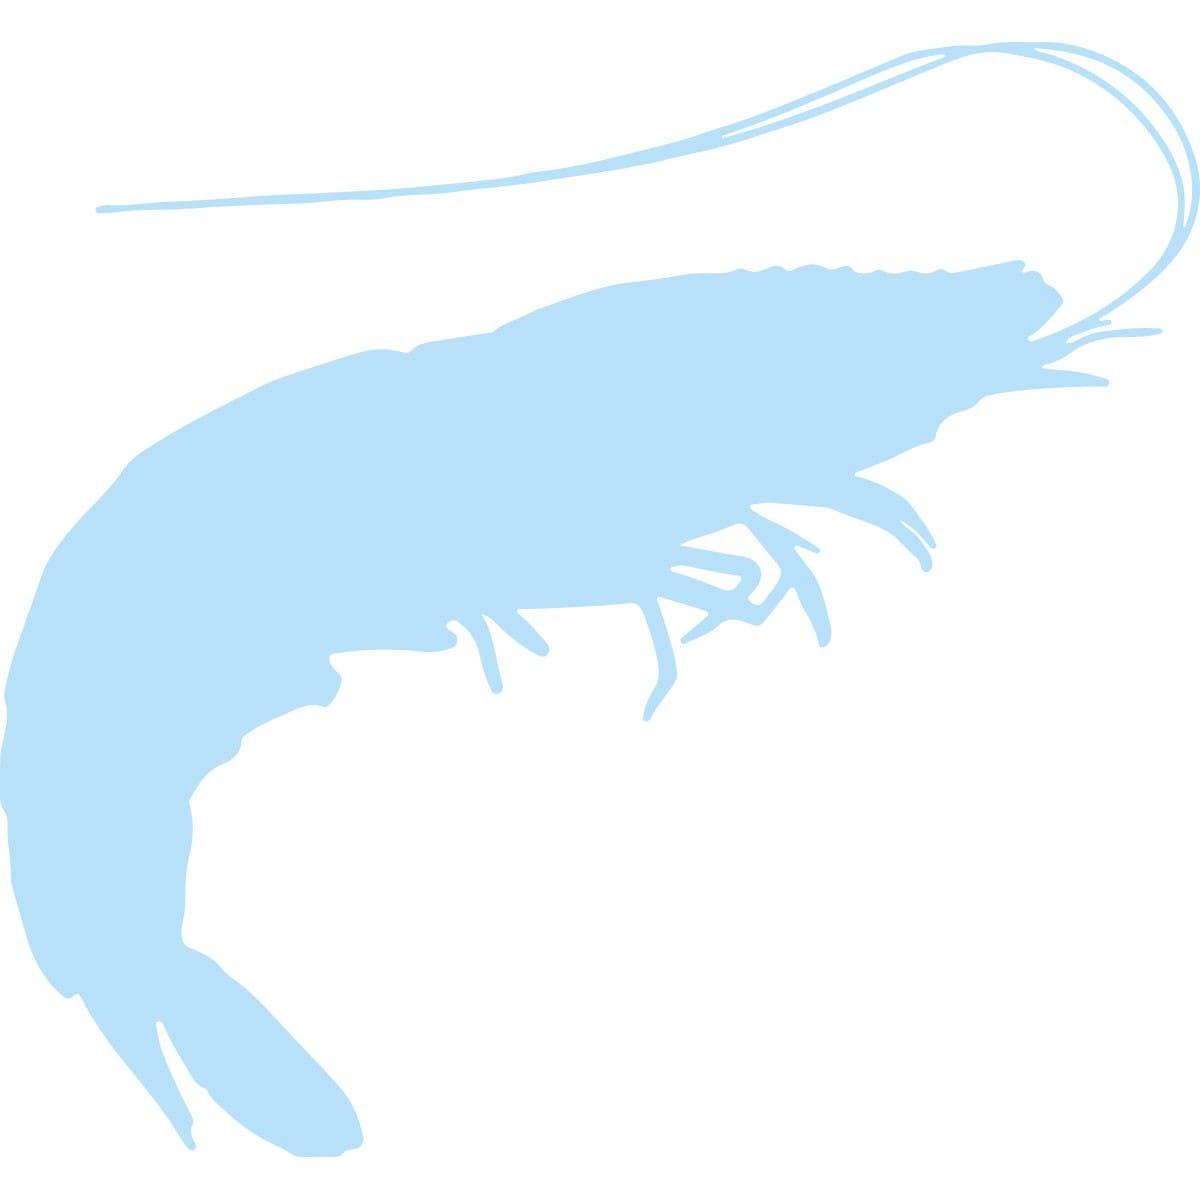 Shrimp Image - 2